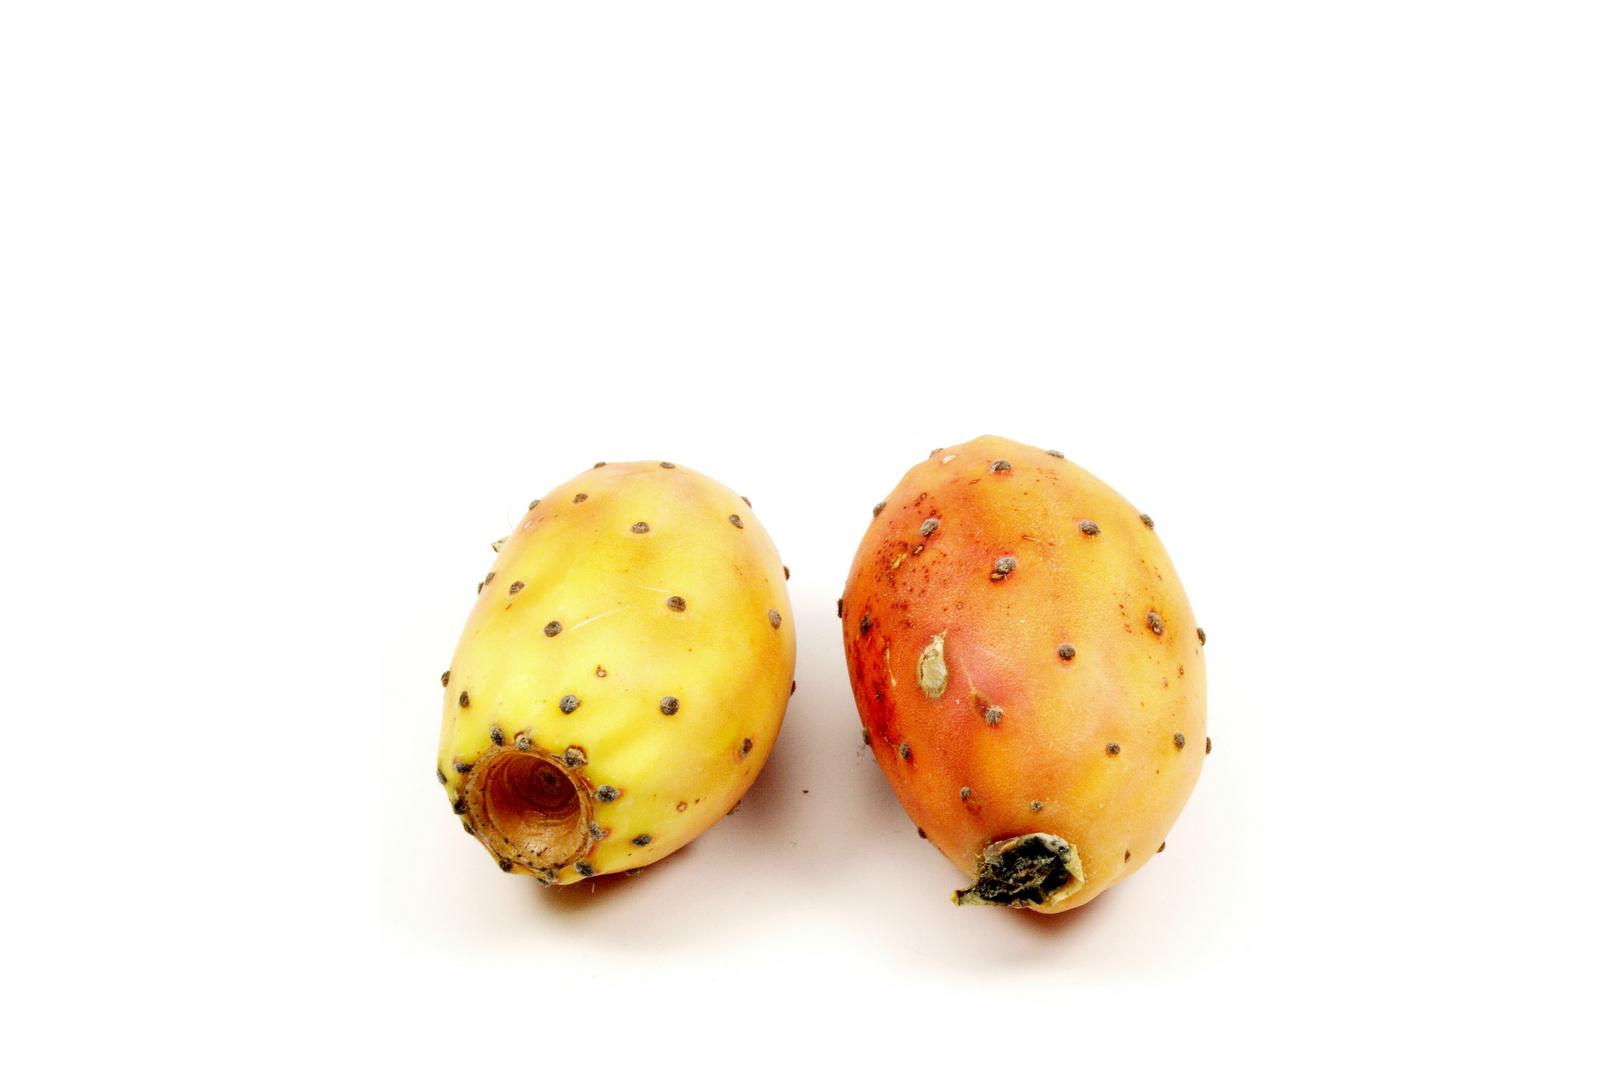 Kaktusfrüchte a